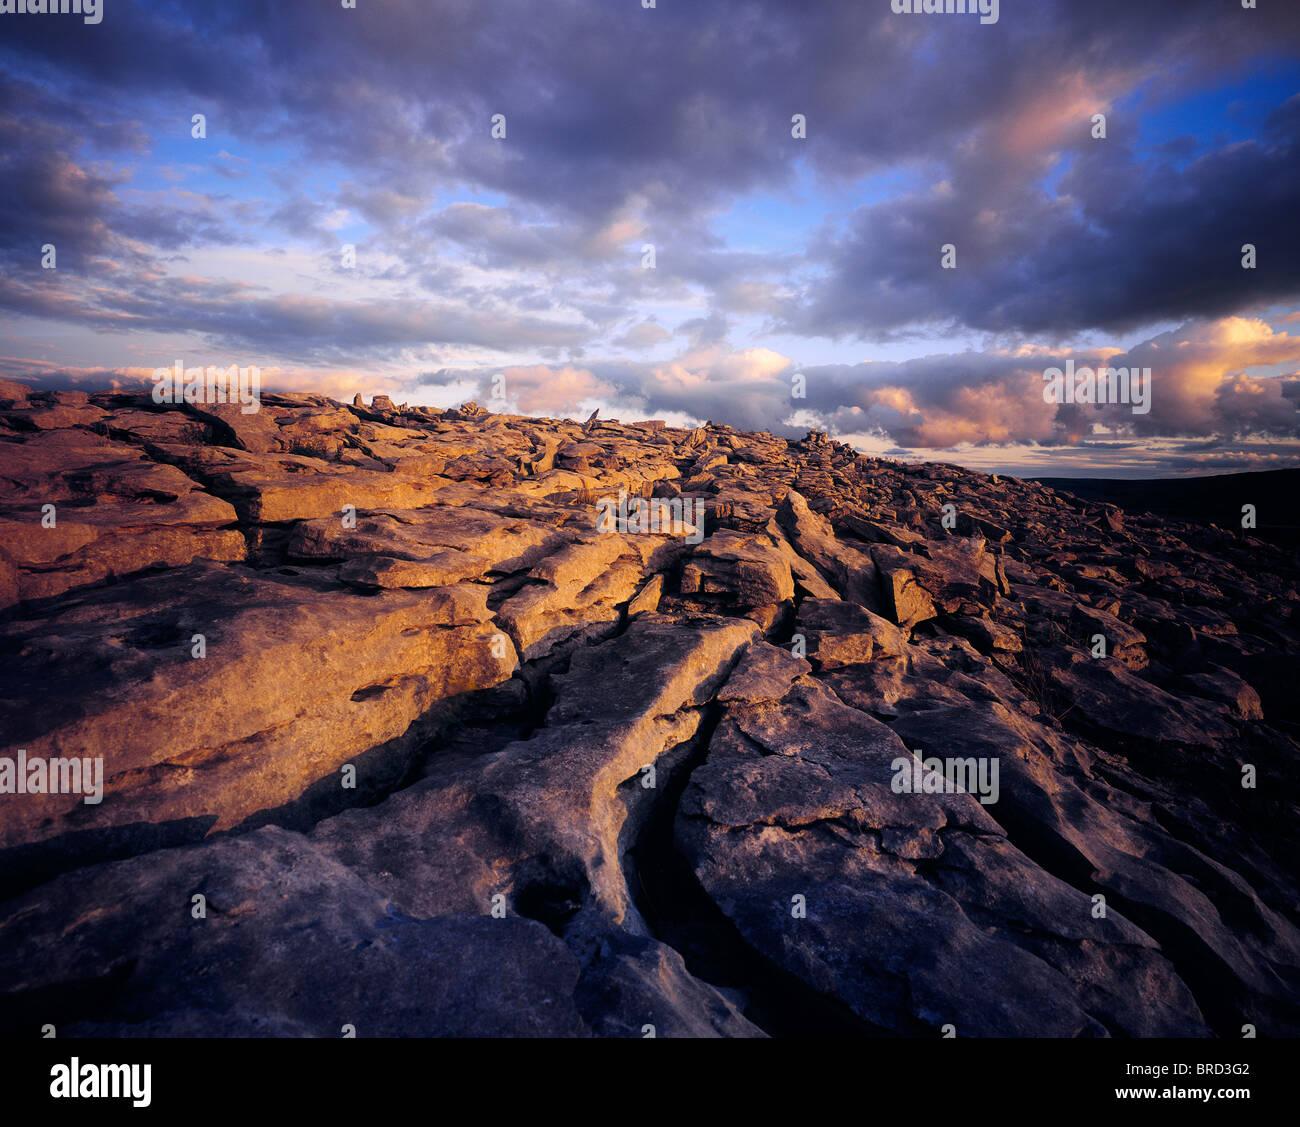 Der Burren, Co. Clare, Irland, Karstlandschaft Region Stockbild